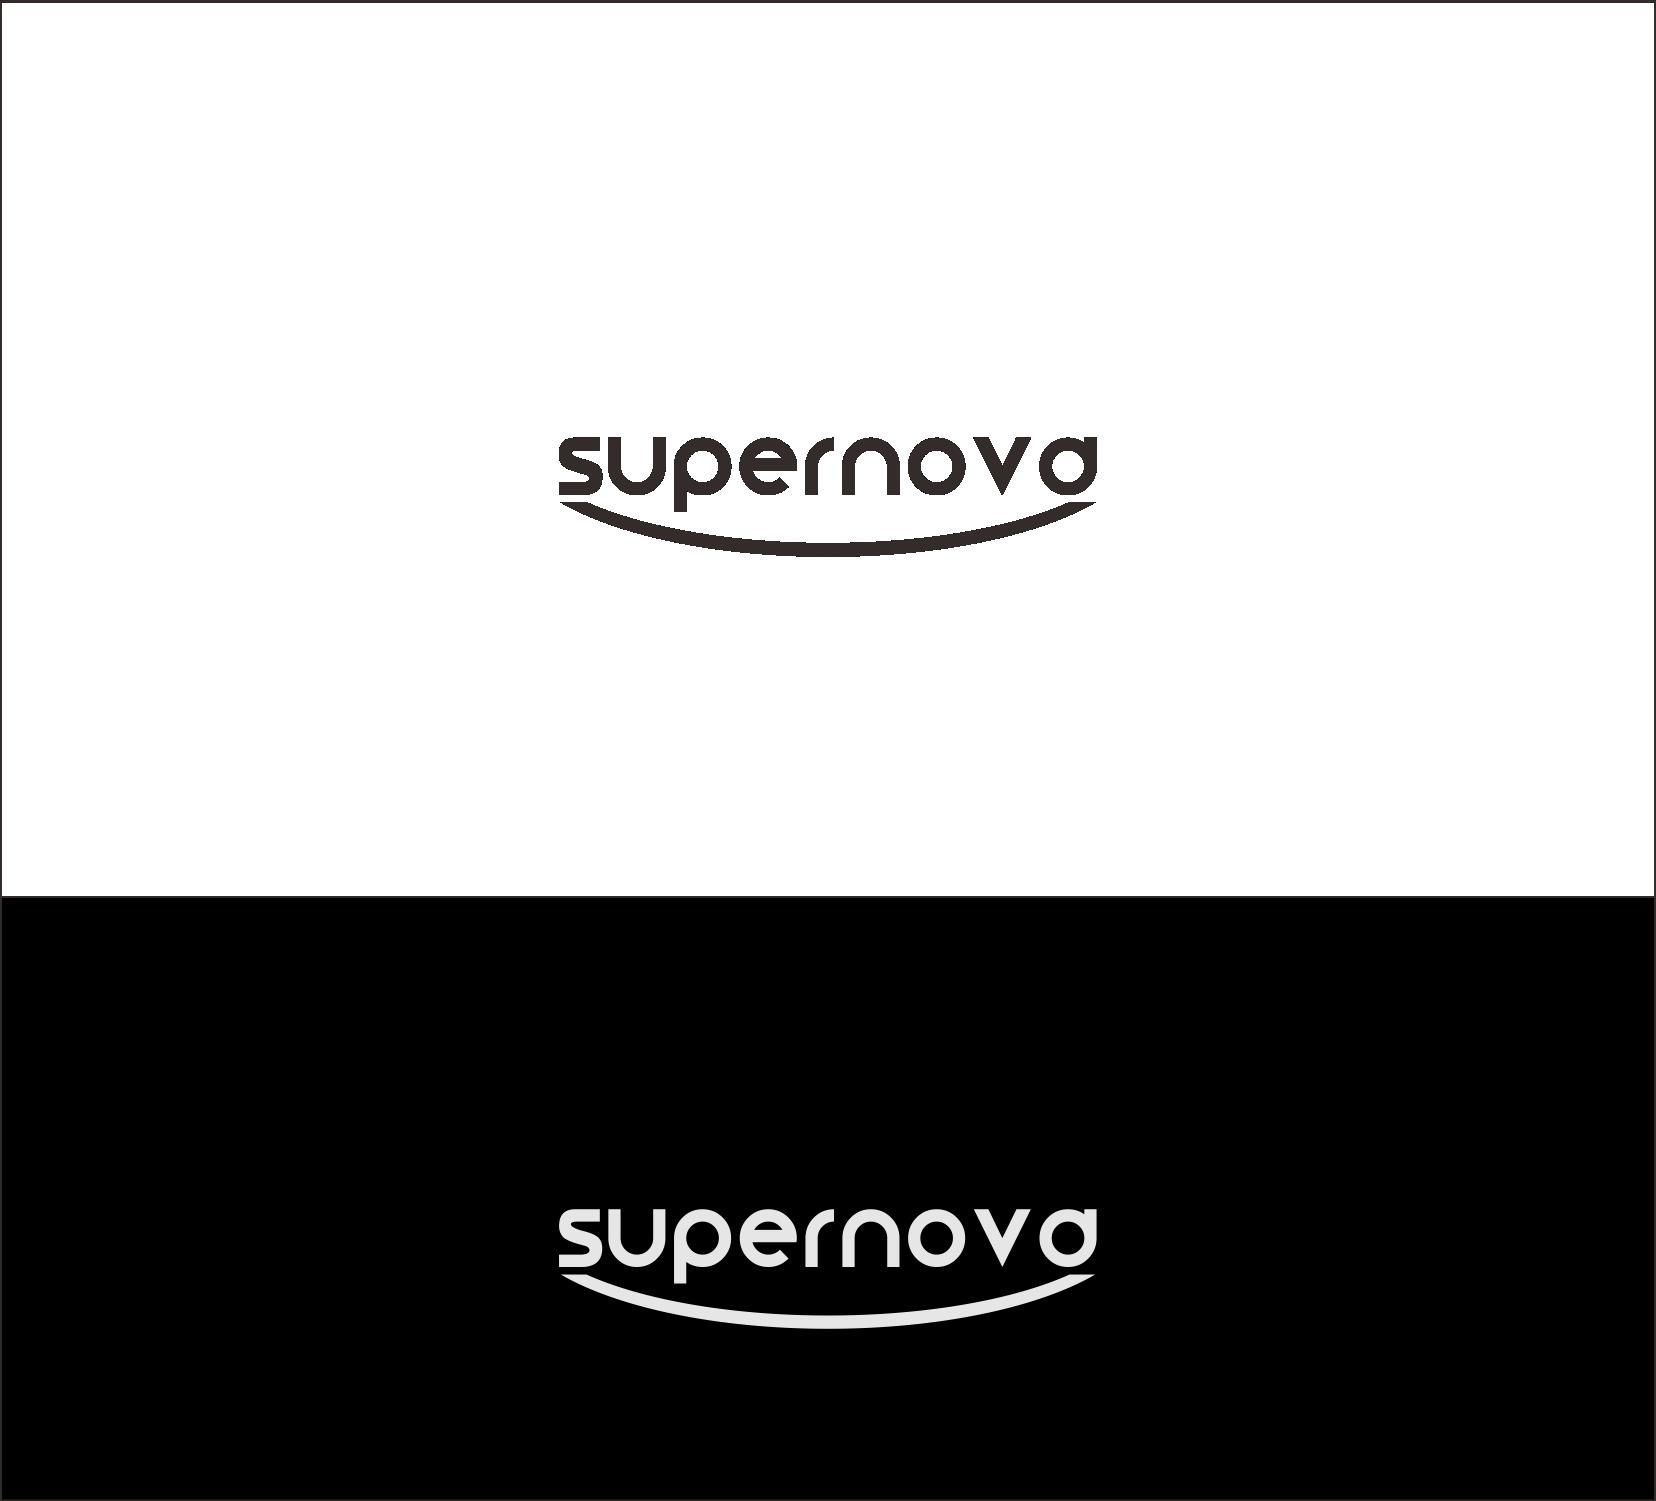 Logo Design by Red Zone - Entry No. 232 in the Logo Design Contest Creative Logo Design for Supernova.